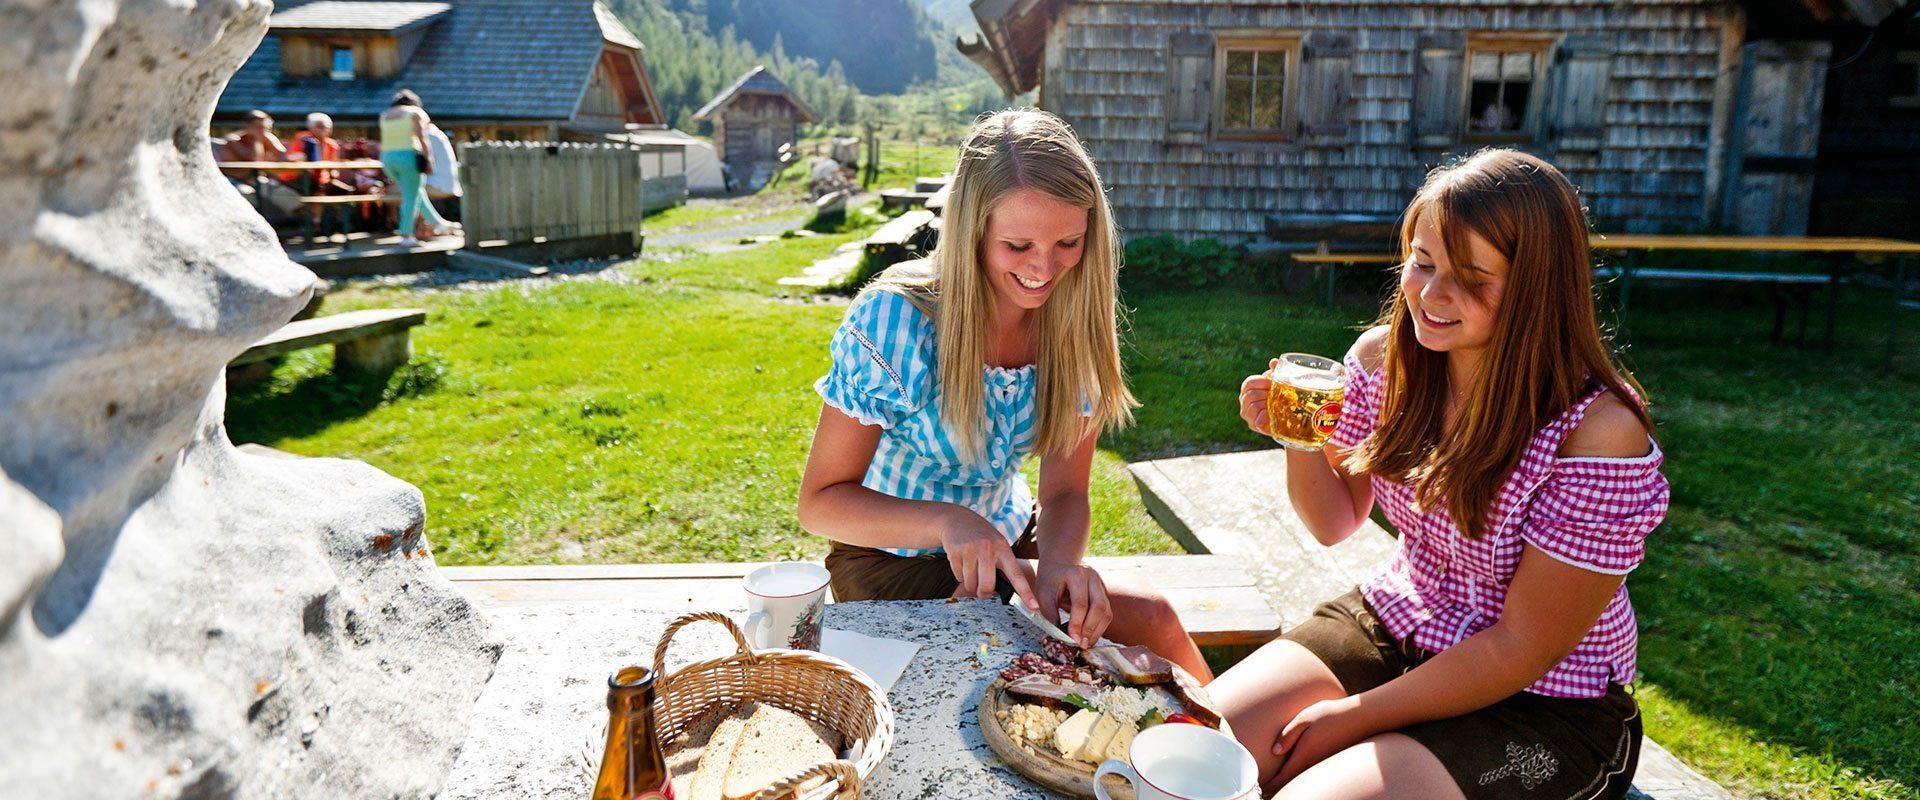 Urlaub im Murtal, Steiermark